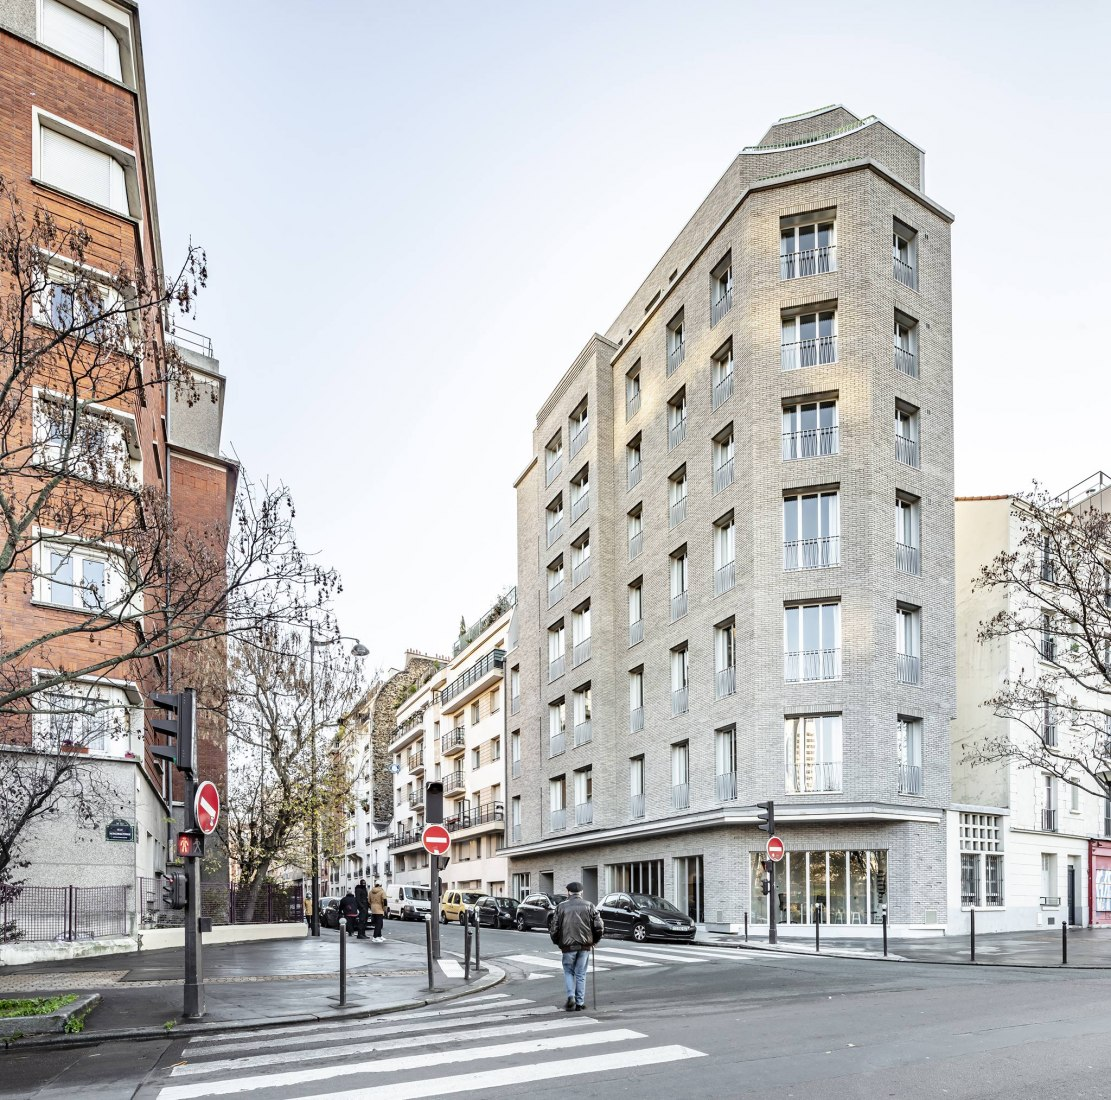 Refurbishment 19 rue de Ridder by CoBe Architecture et Paysage. Photograph by Luc Boegly